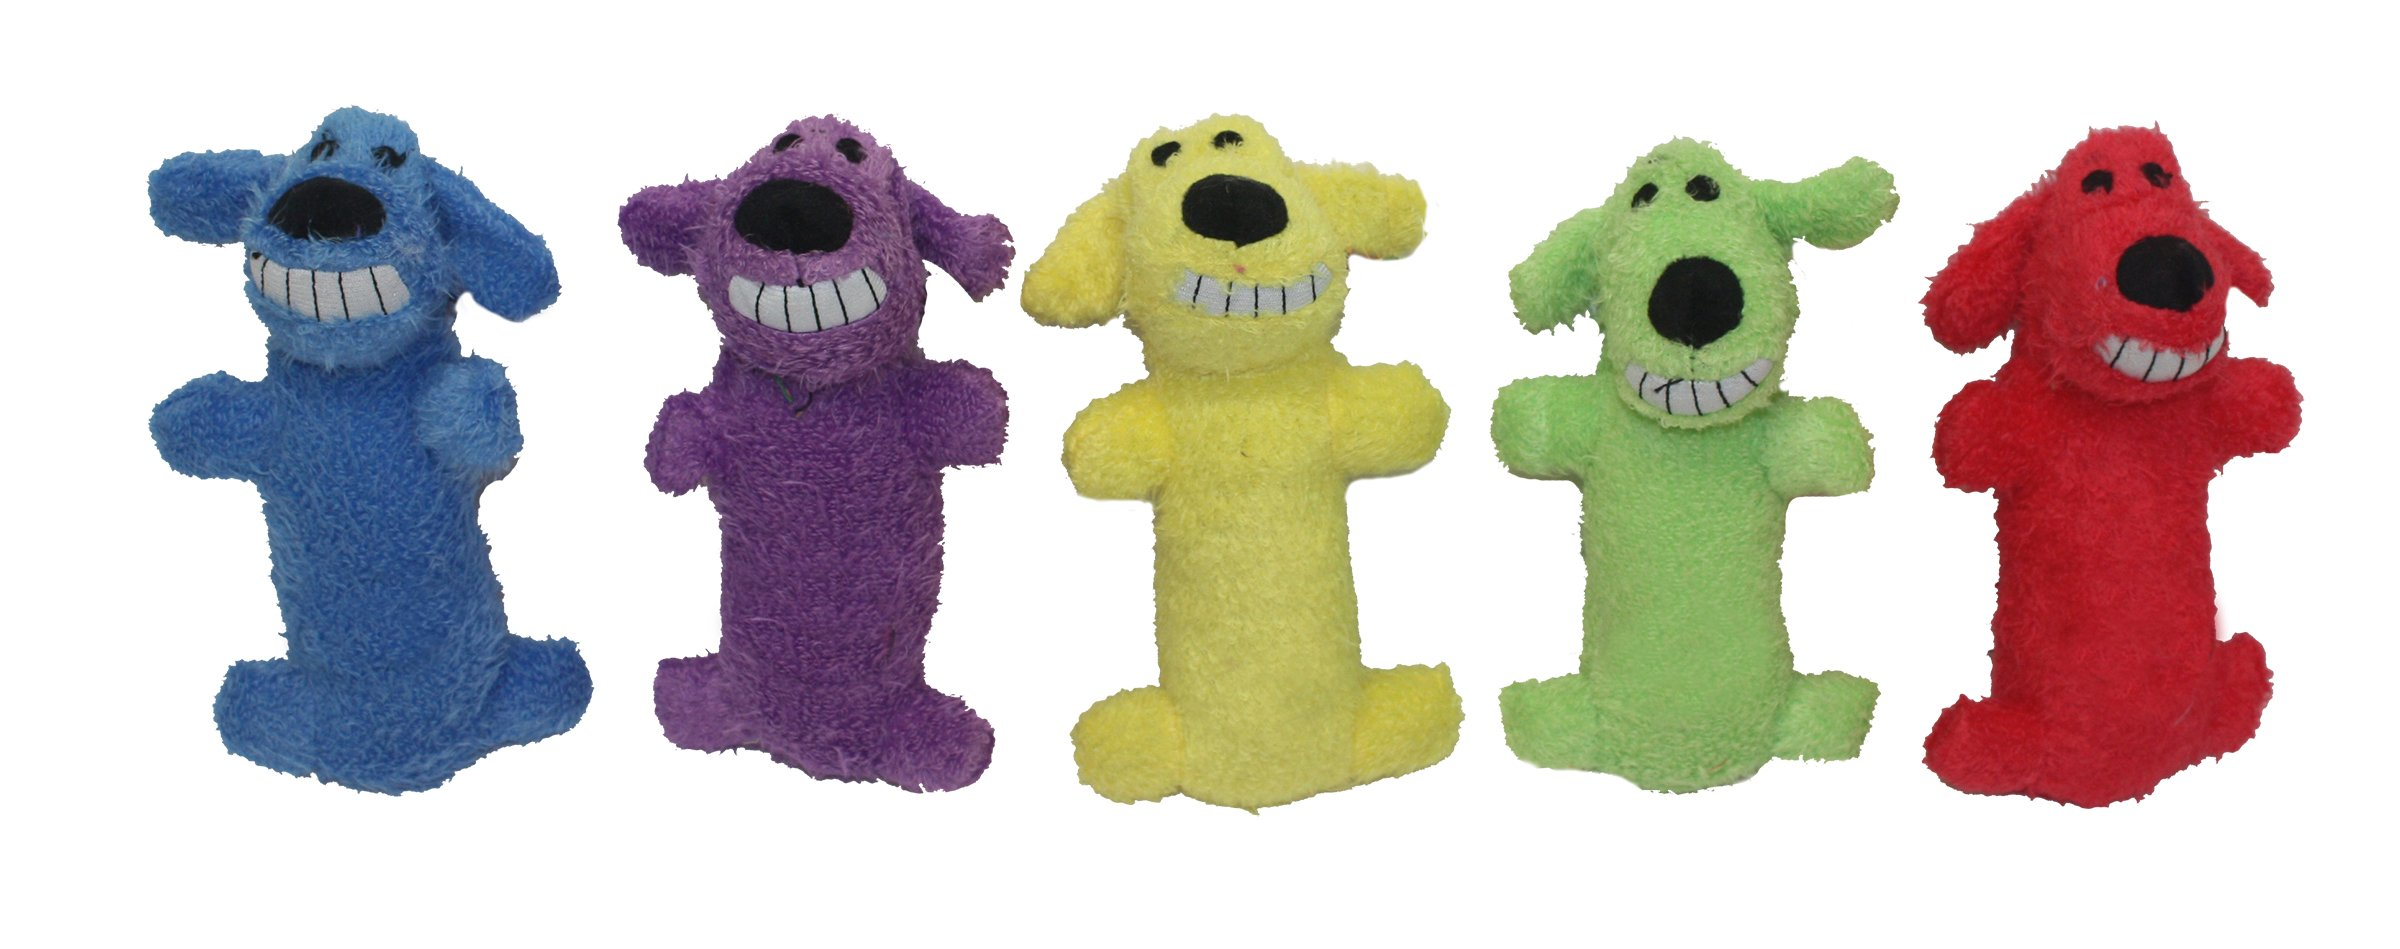 Multipet-International-Original-Loofa-Dog-Mini-6-Inch-Dog-Toy-Assorted-colors